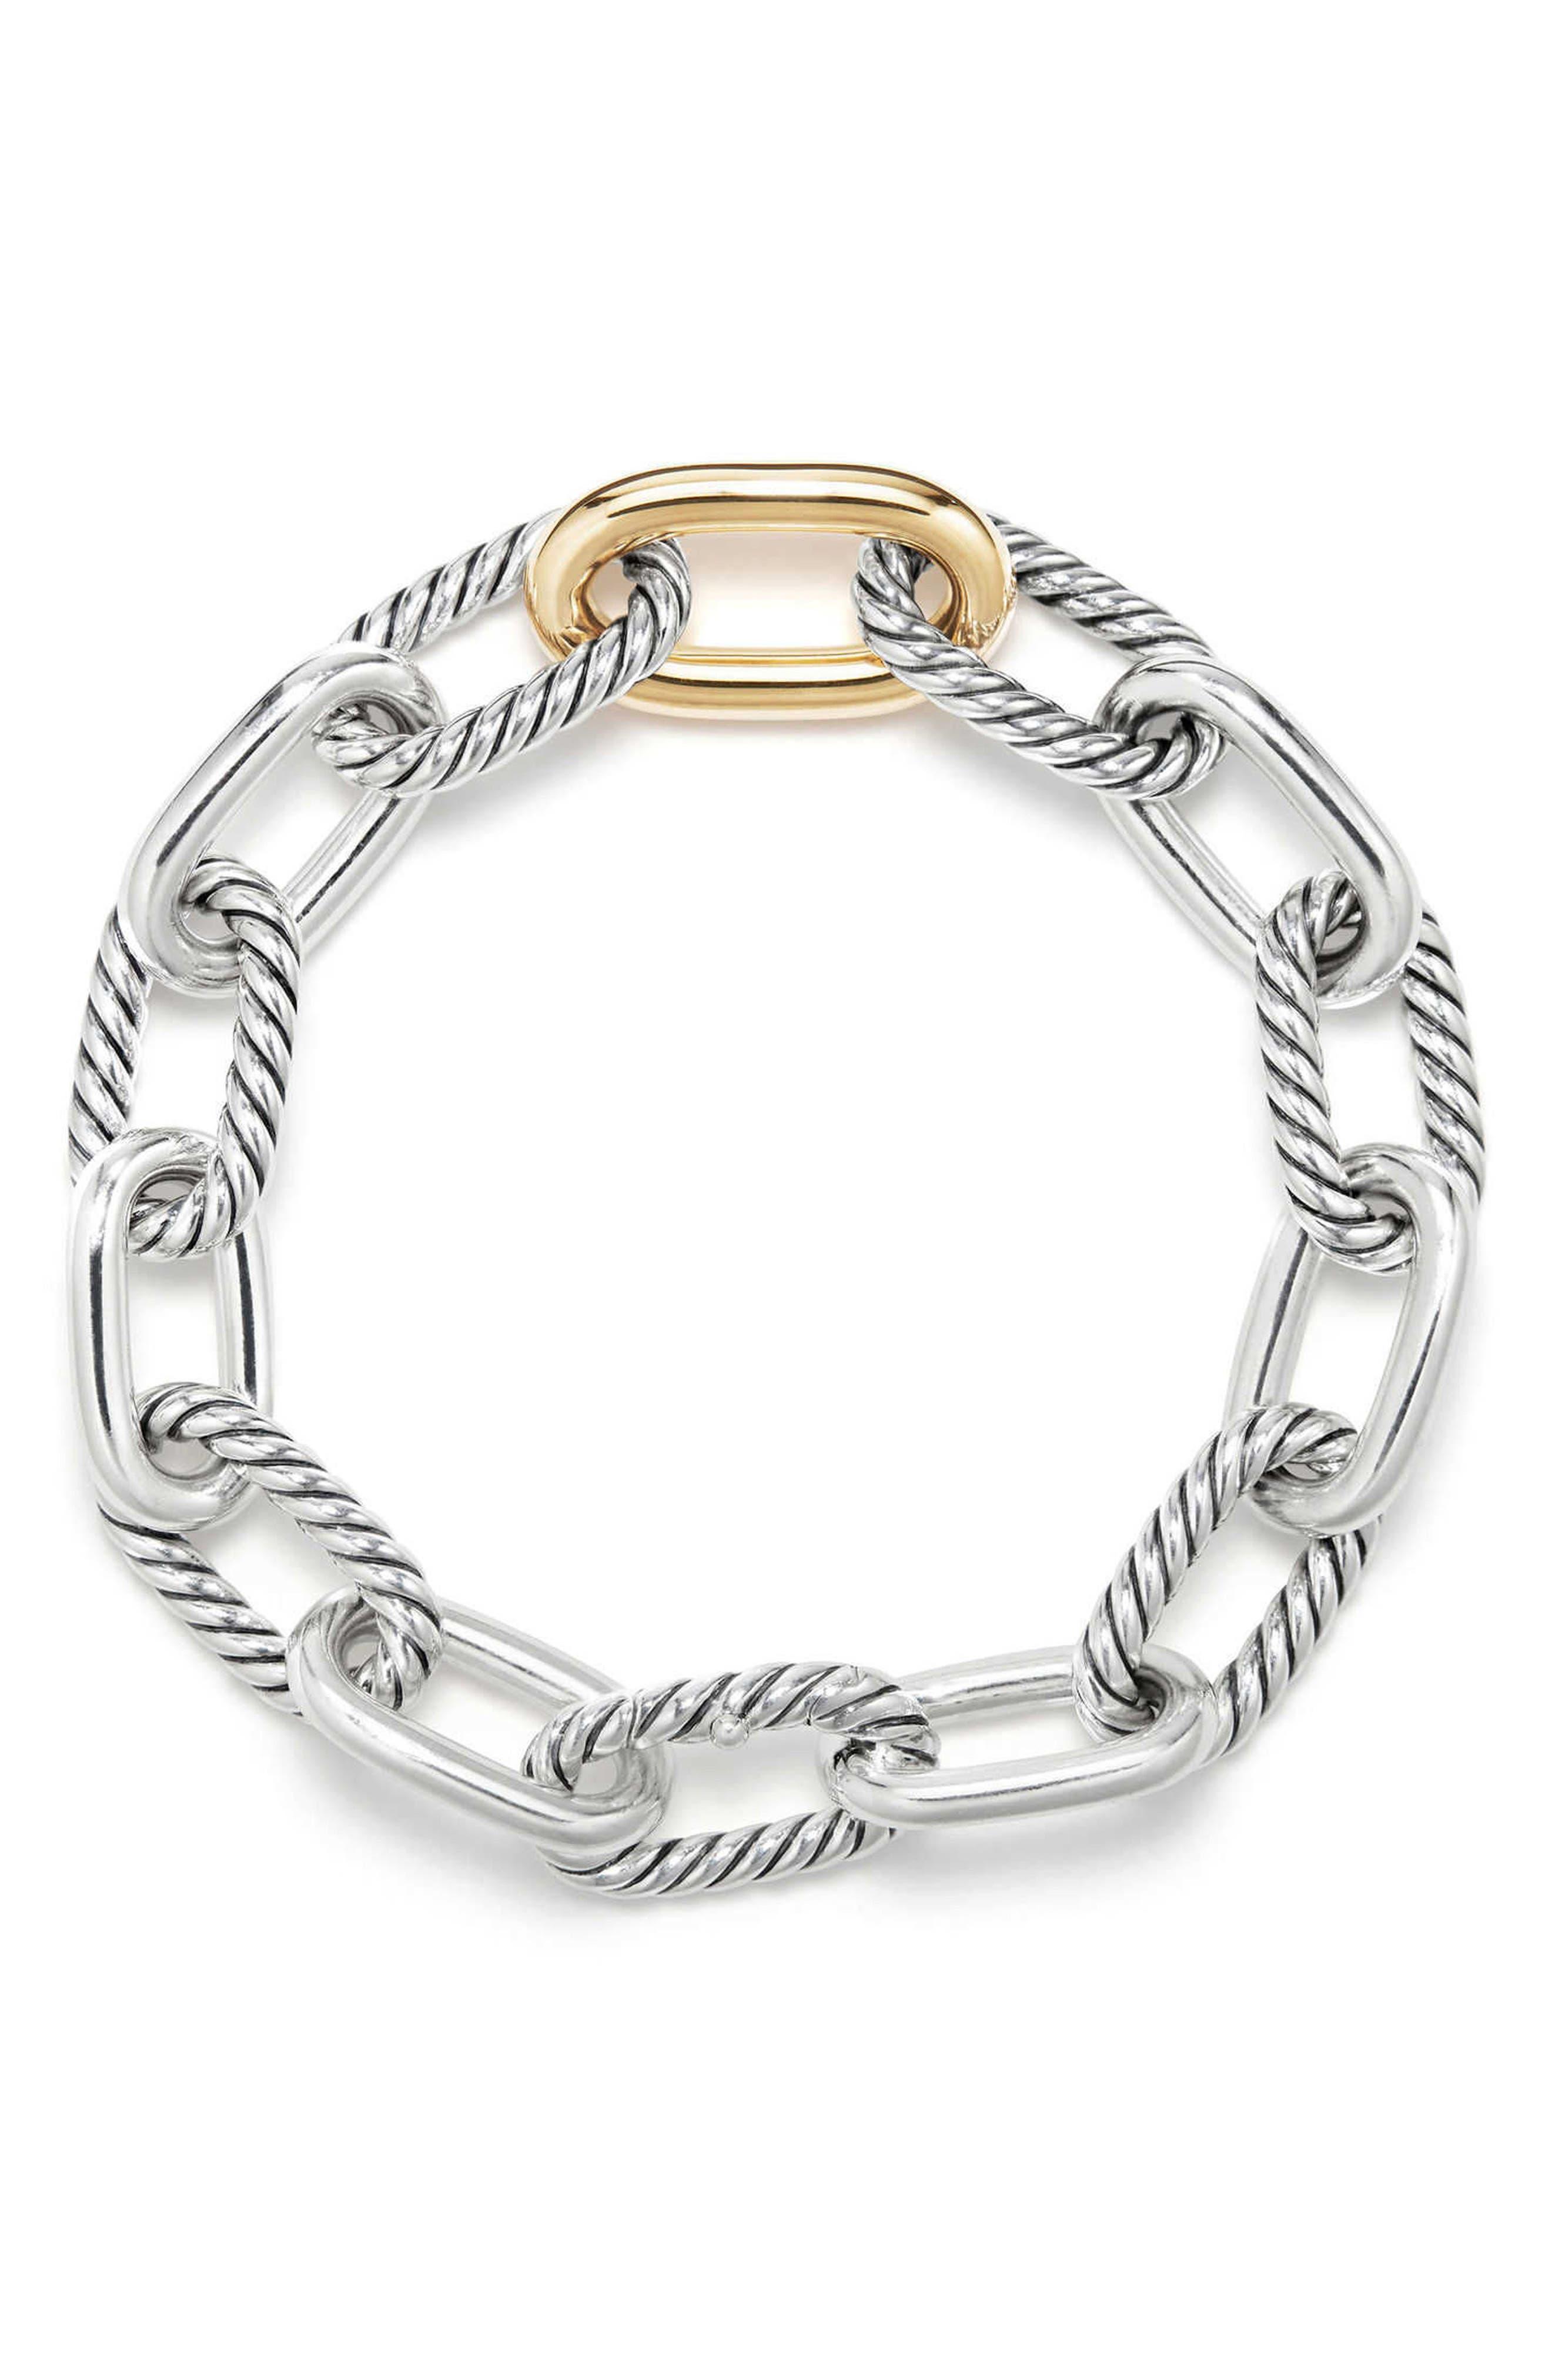 DY Madison Chain Medium Bracelet,                             Alternate thumbnail 2, color,                             GOLD/ SILVER